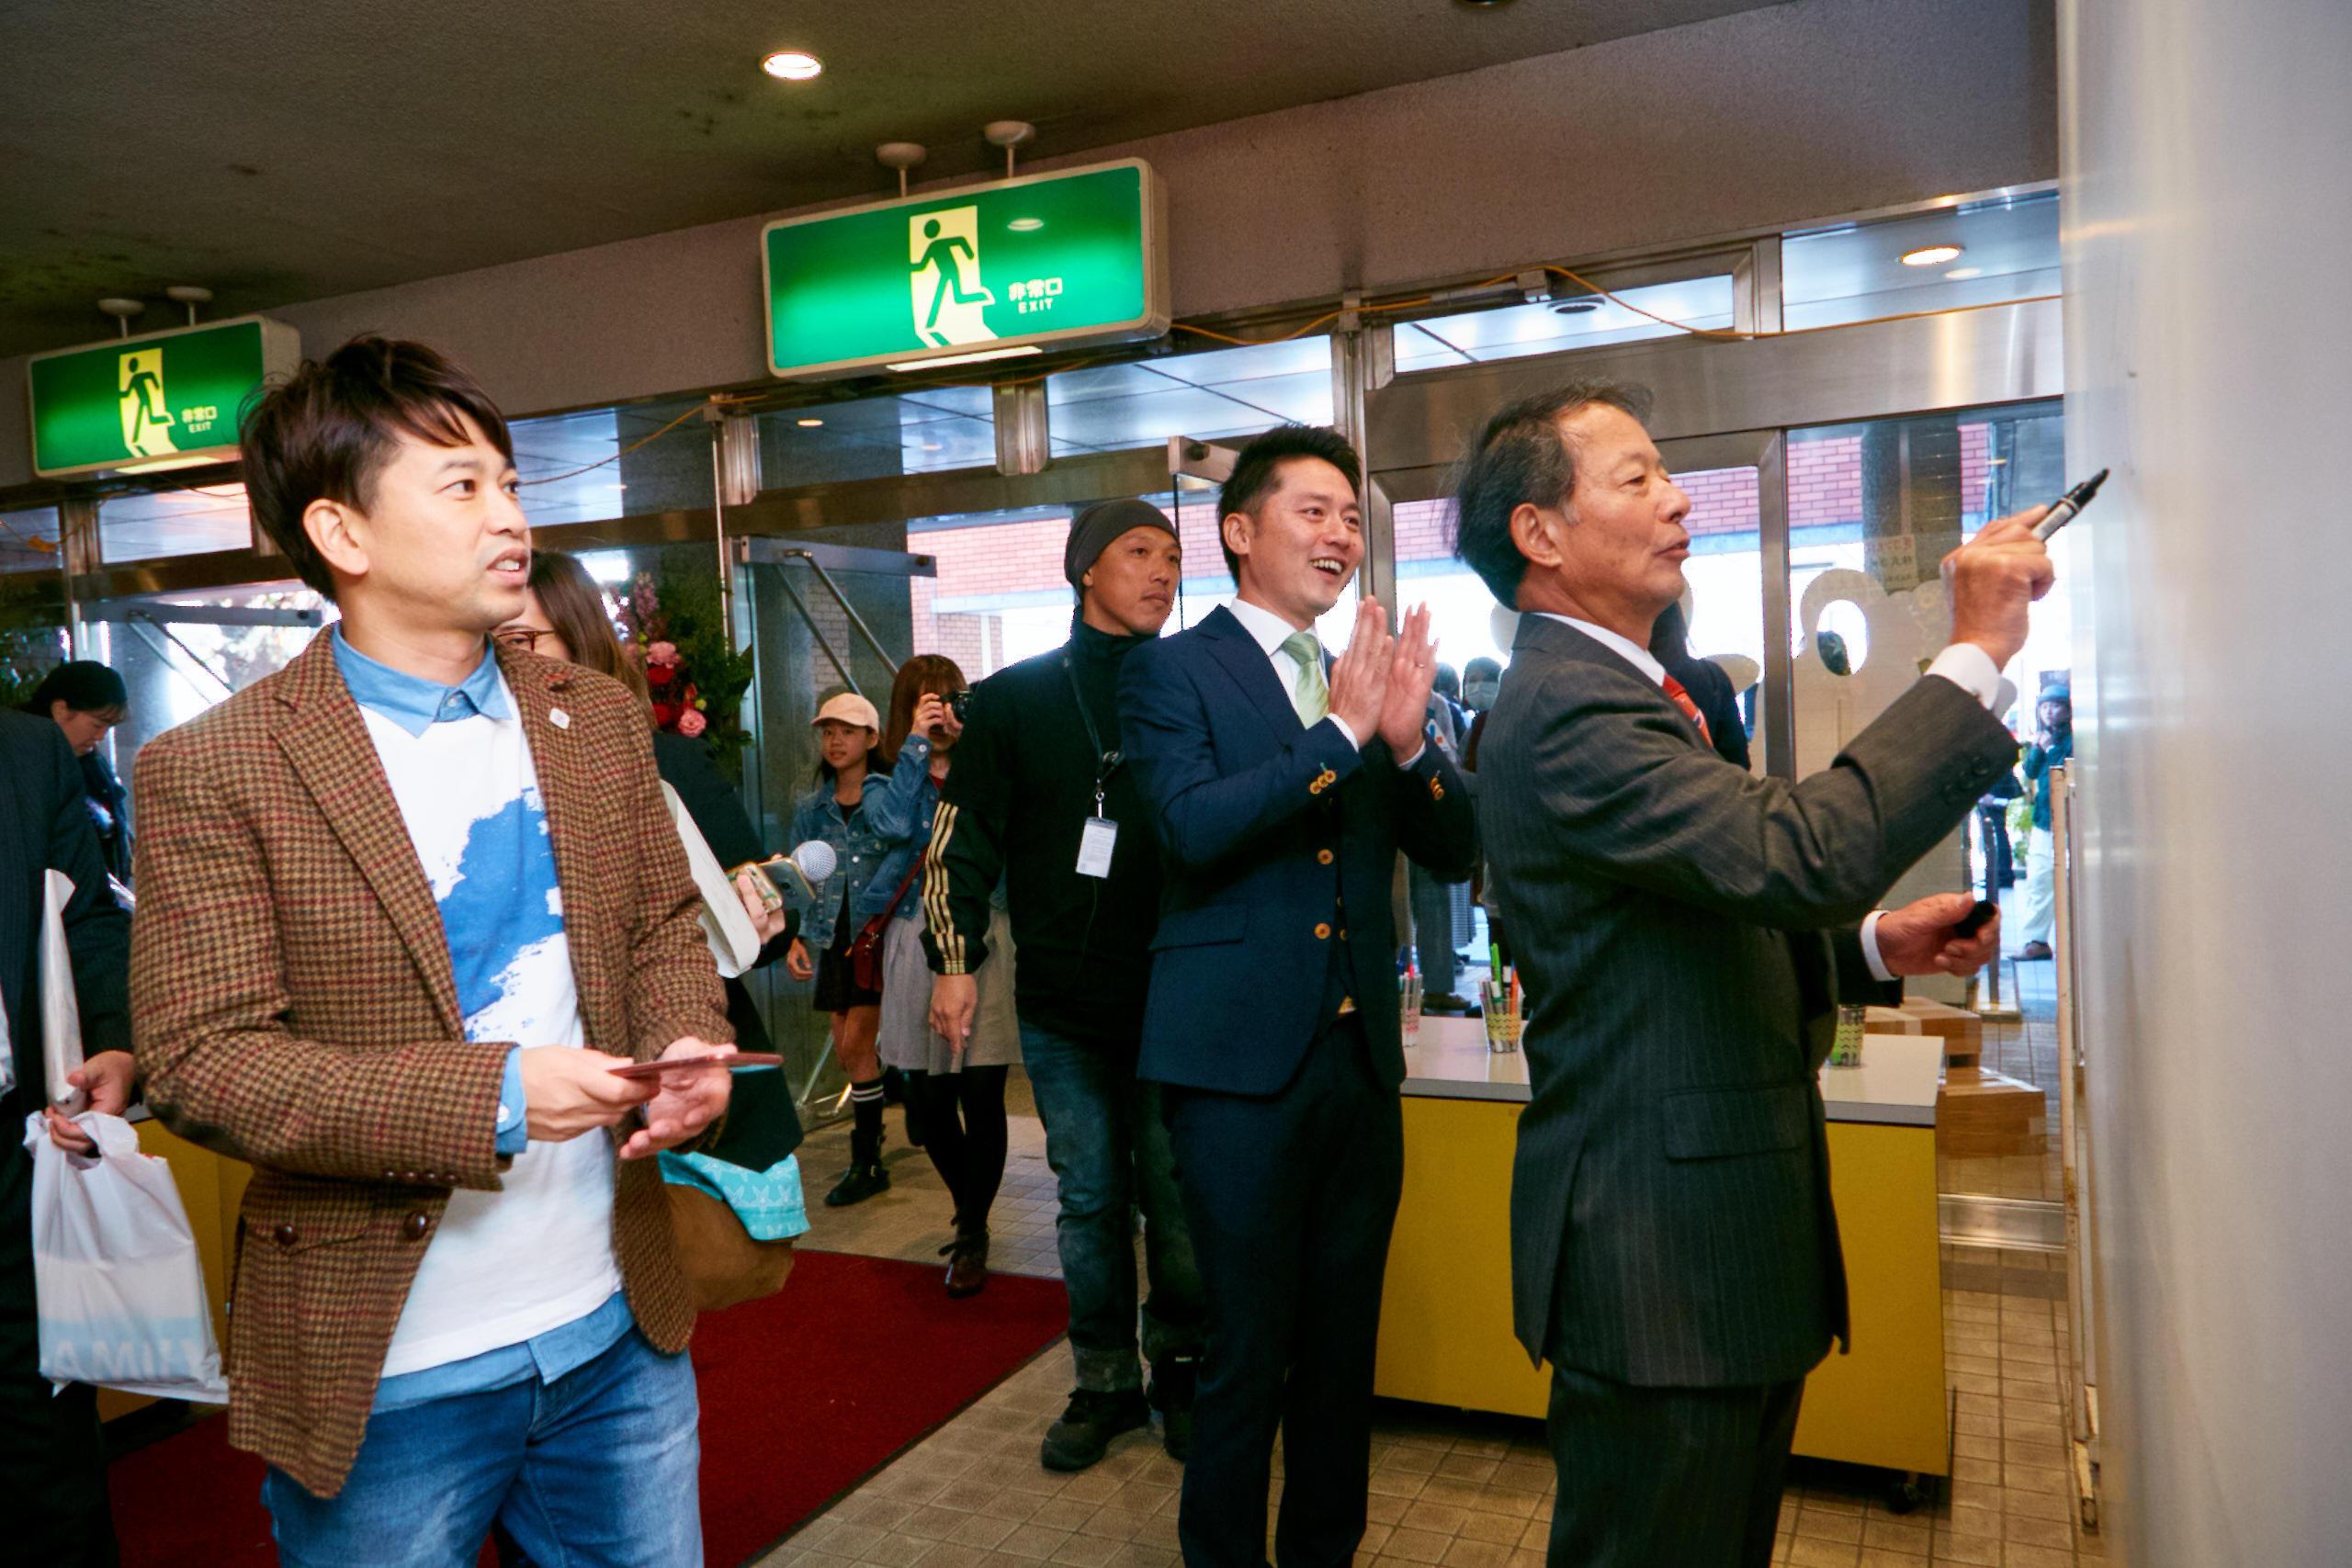 http://news.yoshimoto.co.jp/20171113160356-6b81c8166c18d6a932403e02ca54f0e42d964681.jpg